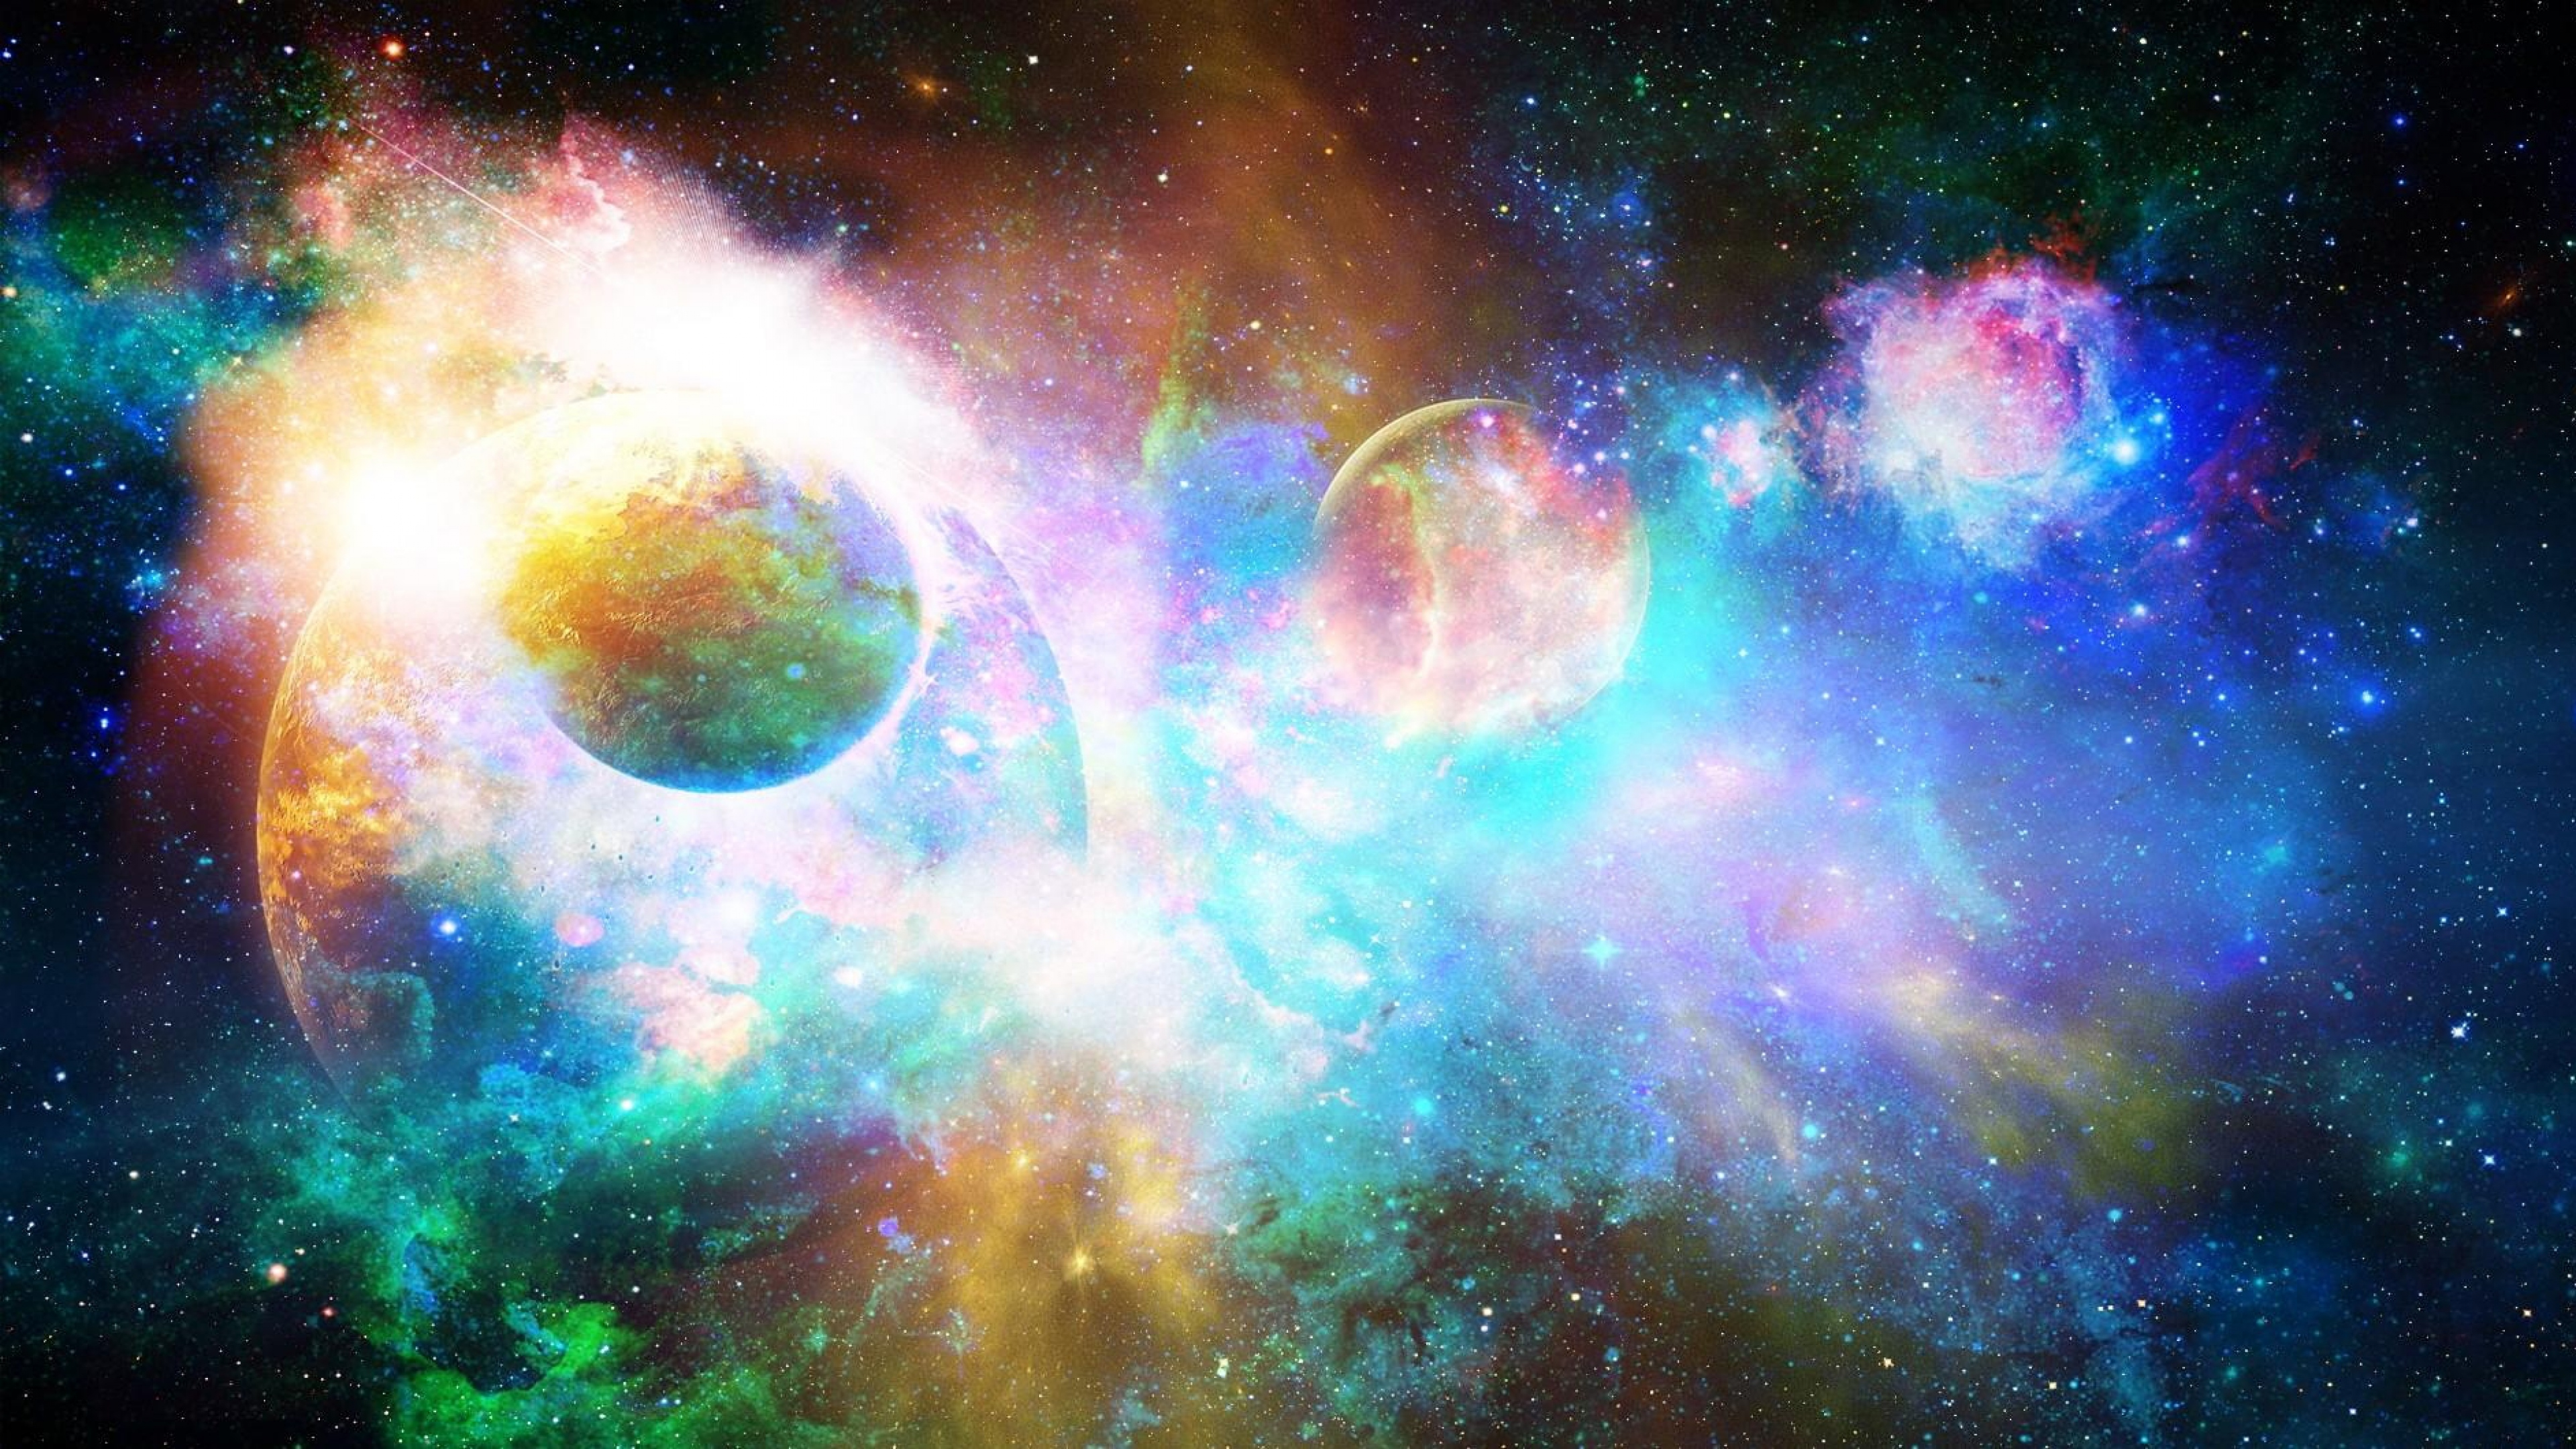 universe desktop wallpaper 4k-#36